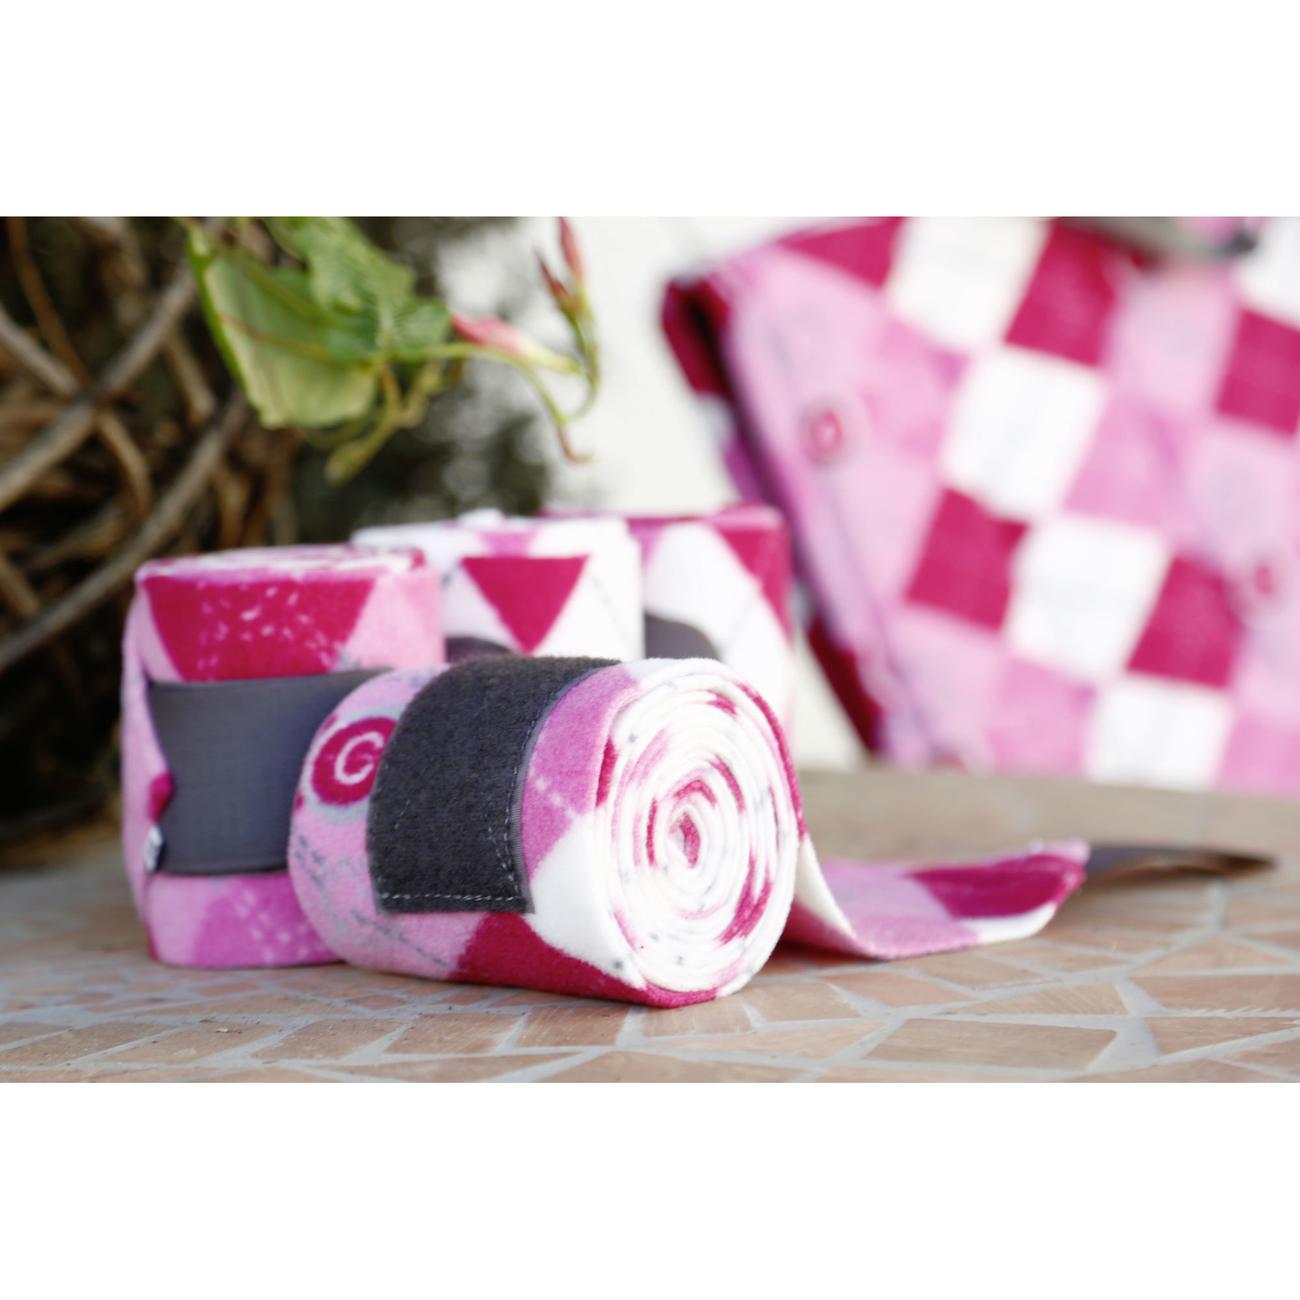 Covalliero Pferde Fleece Bandage Lilli für Pony, Bild 2